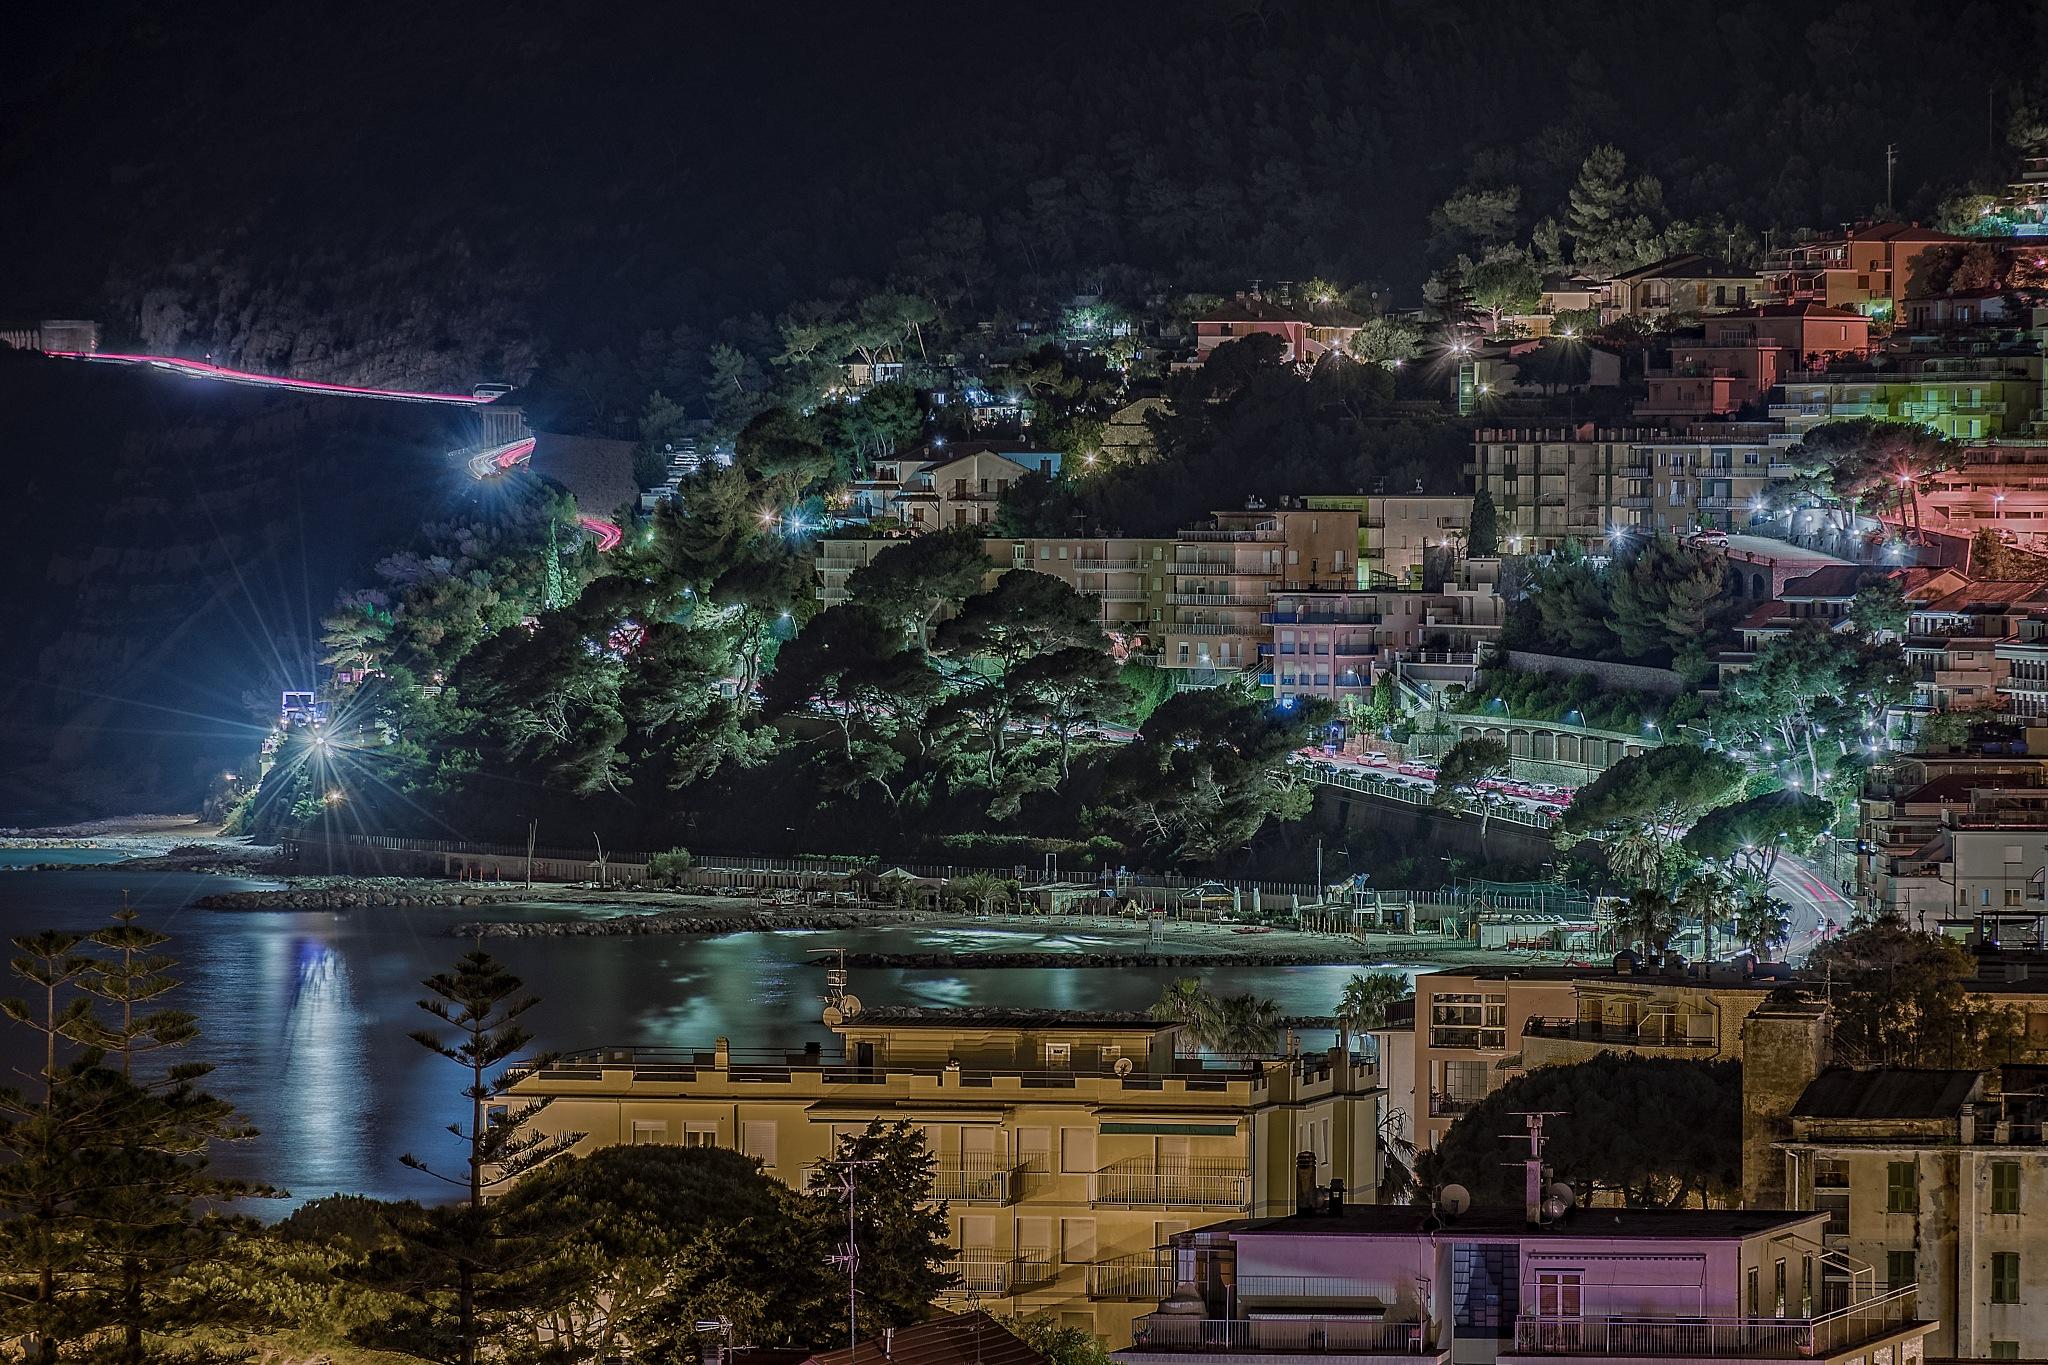 Lights in the night by Mauro De Vita